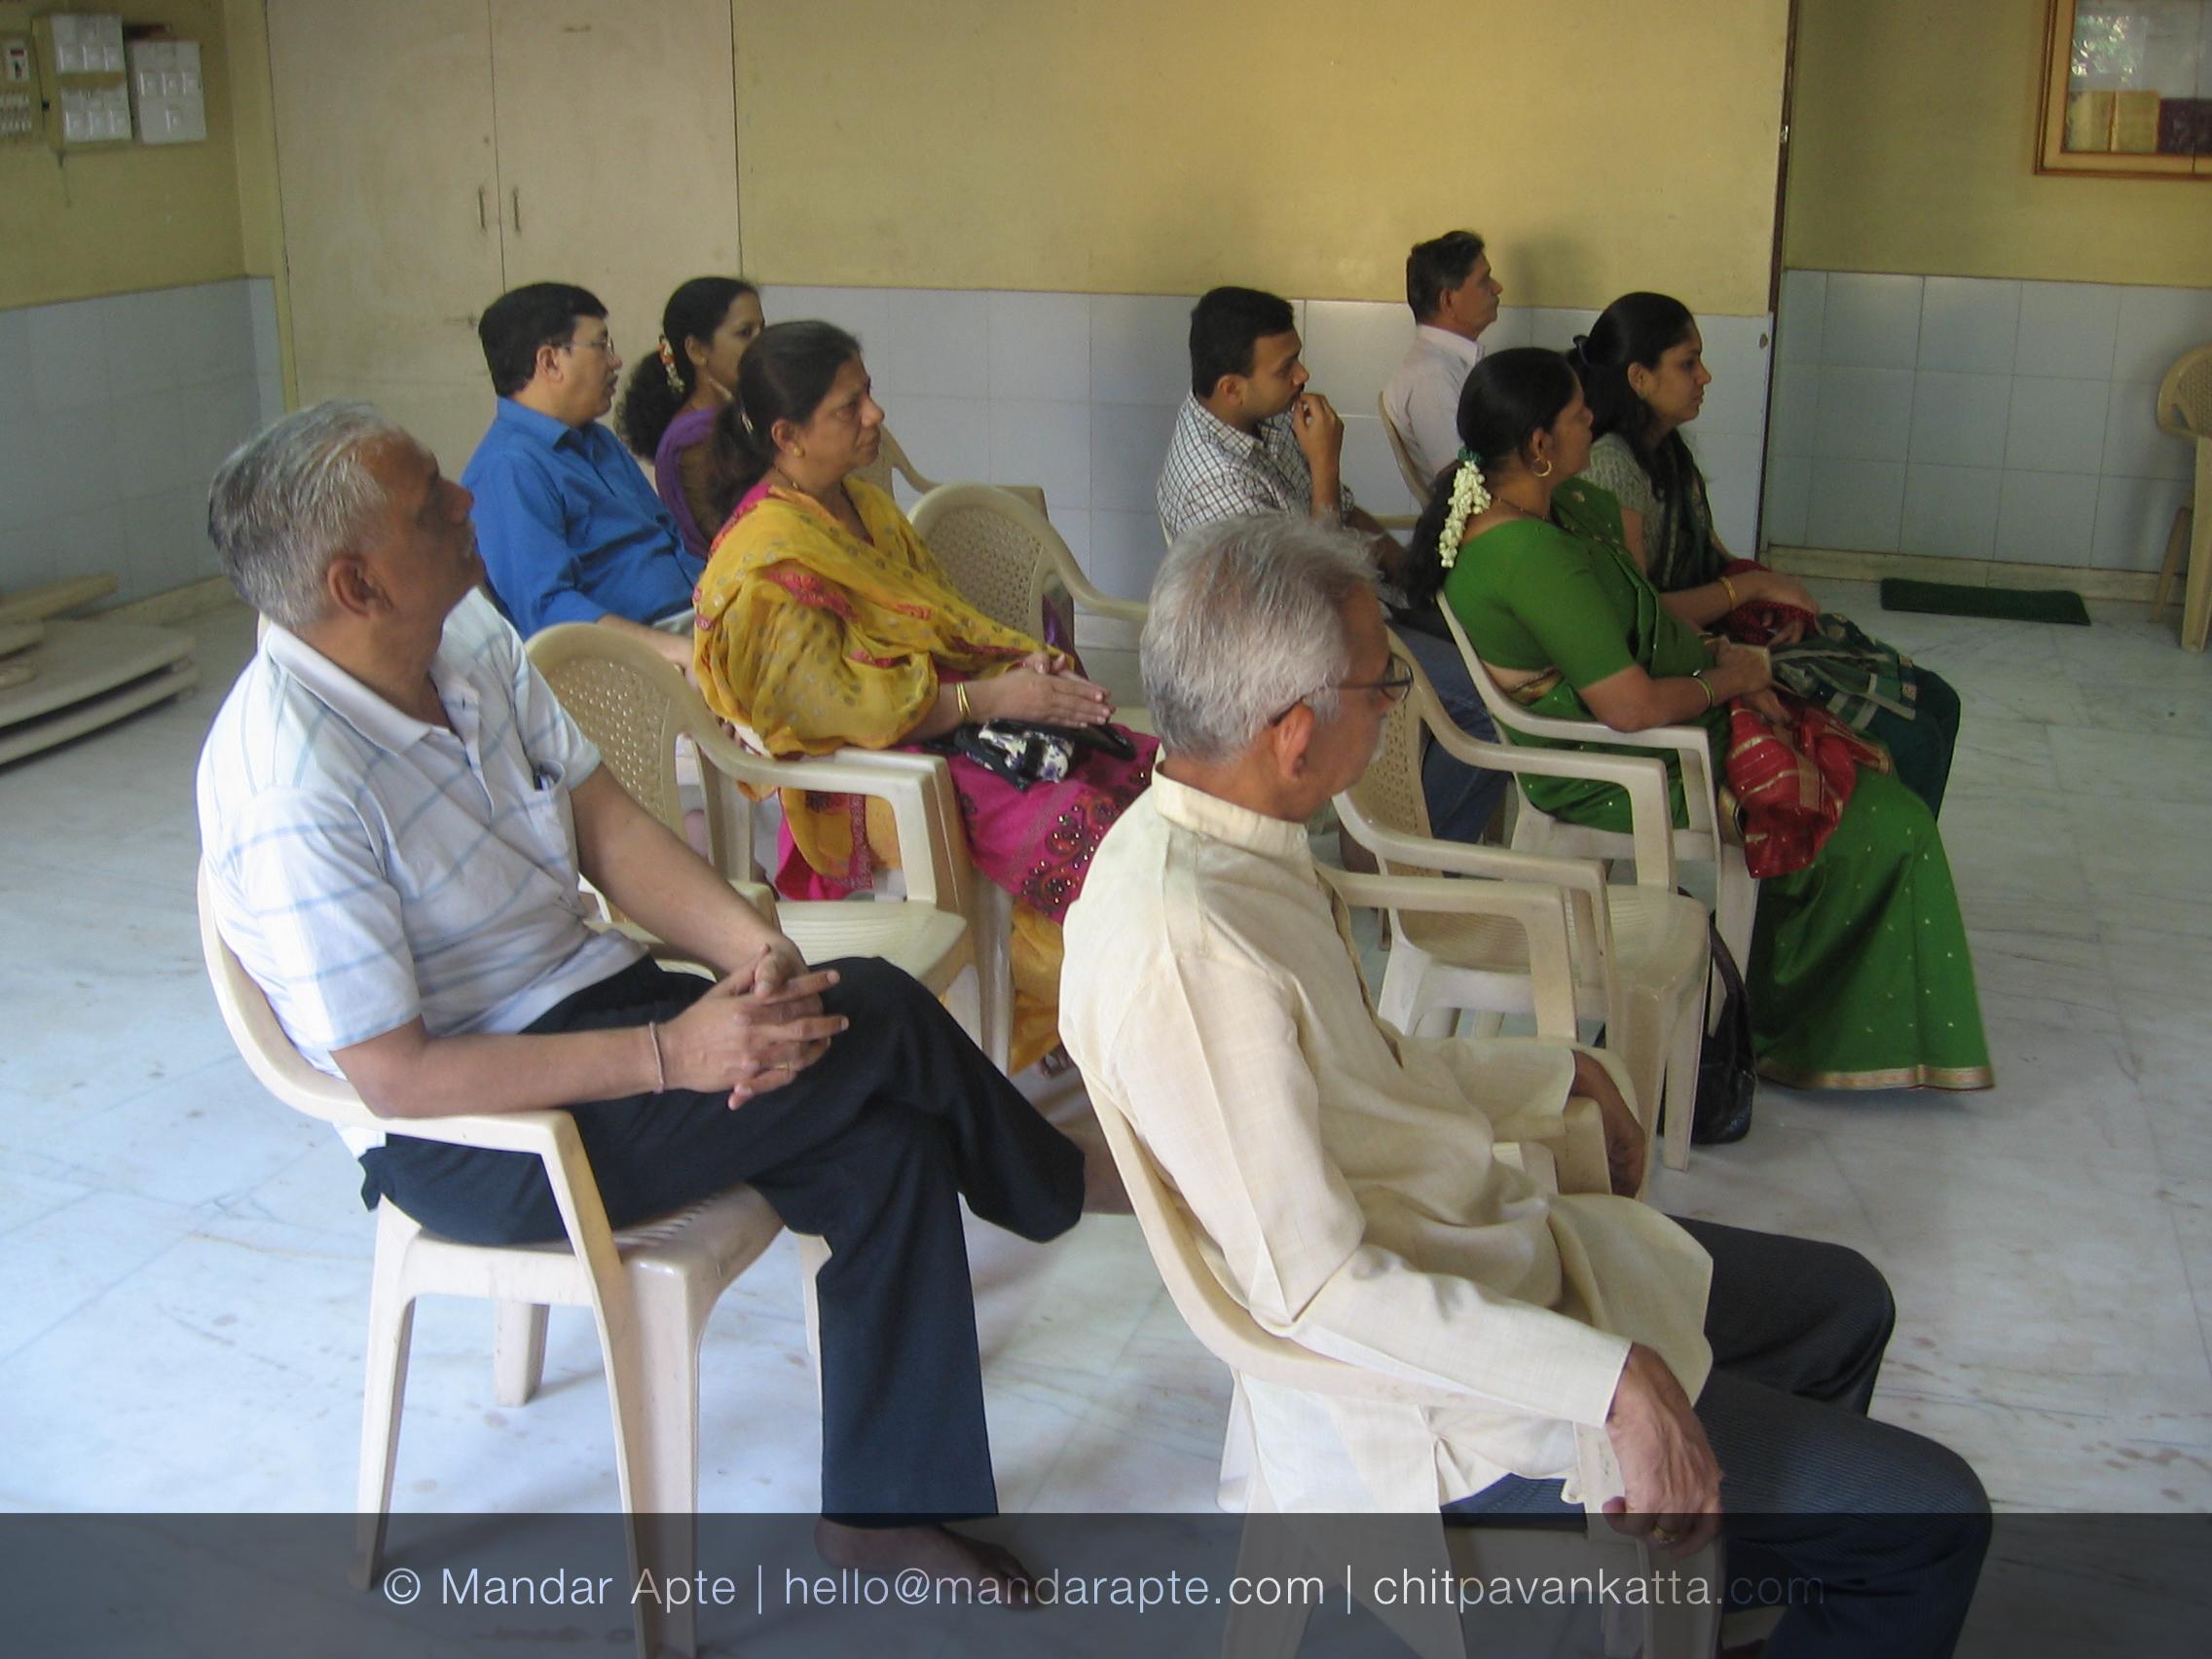 Mahashivaratri at Chitpavan Sangha Mulund 10th March 2013 08